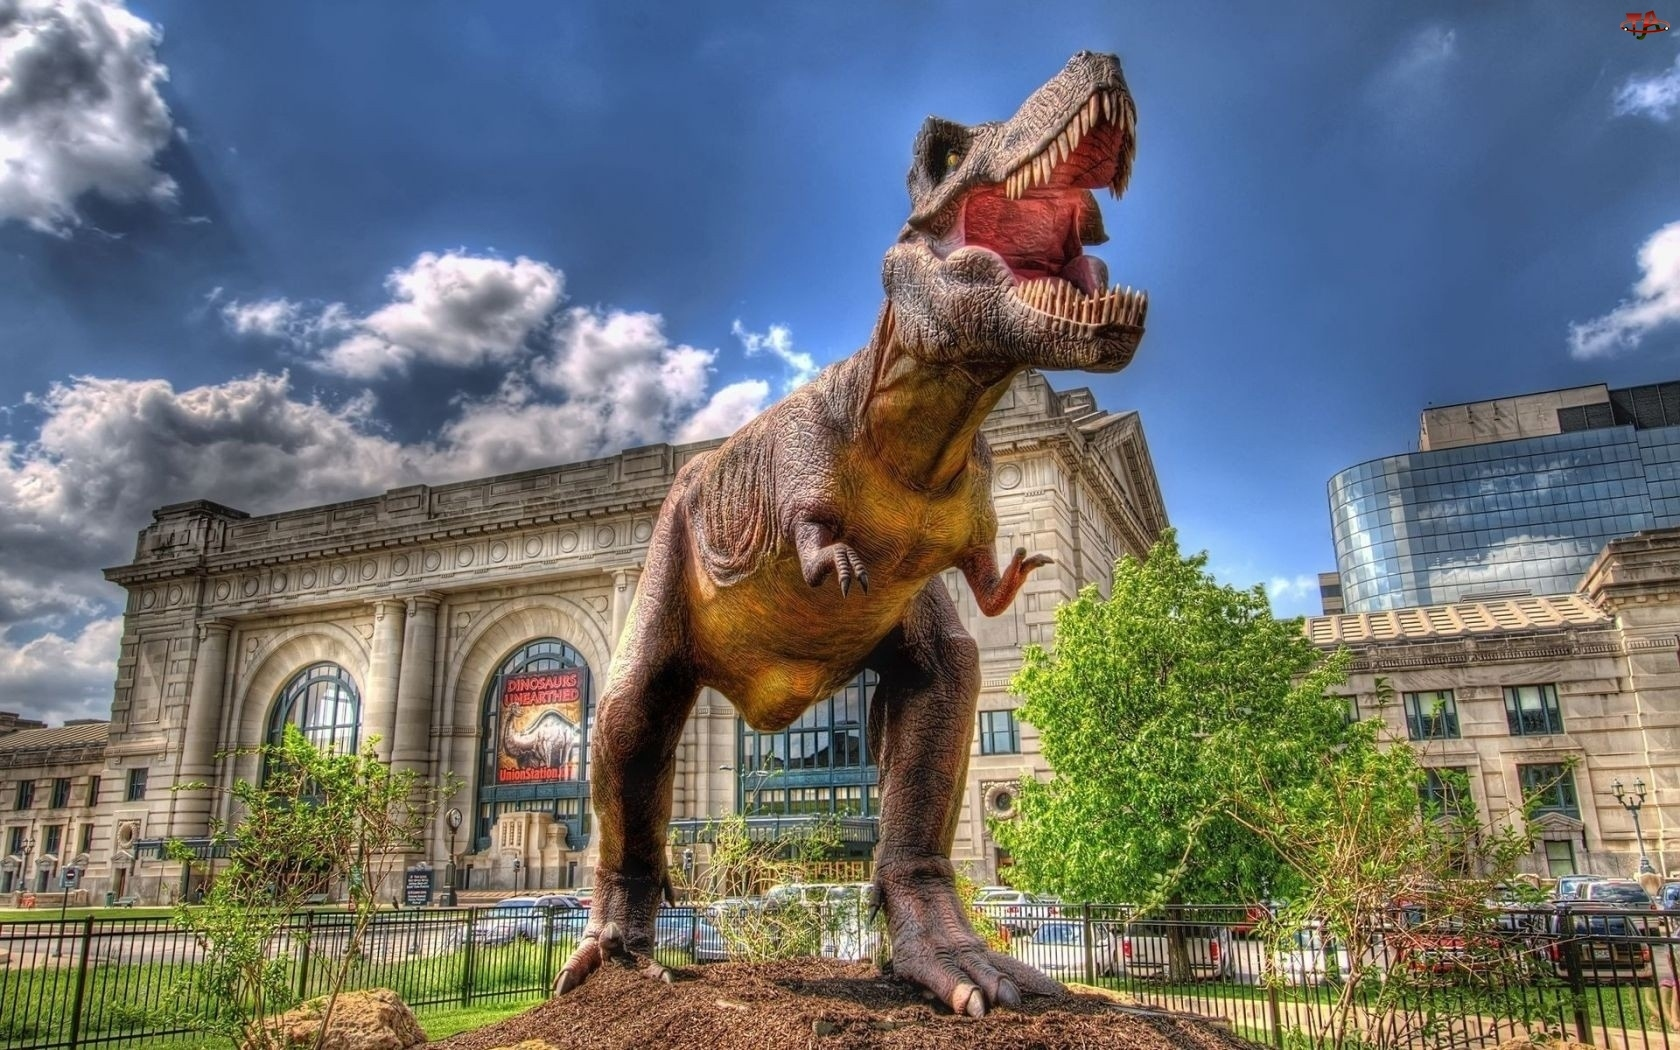 Park, Tyranozaur, Jurassic